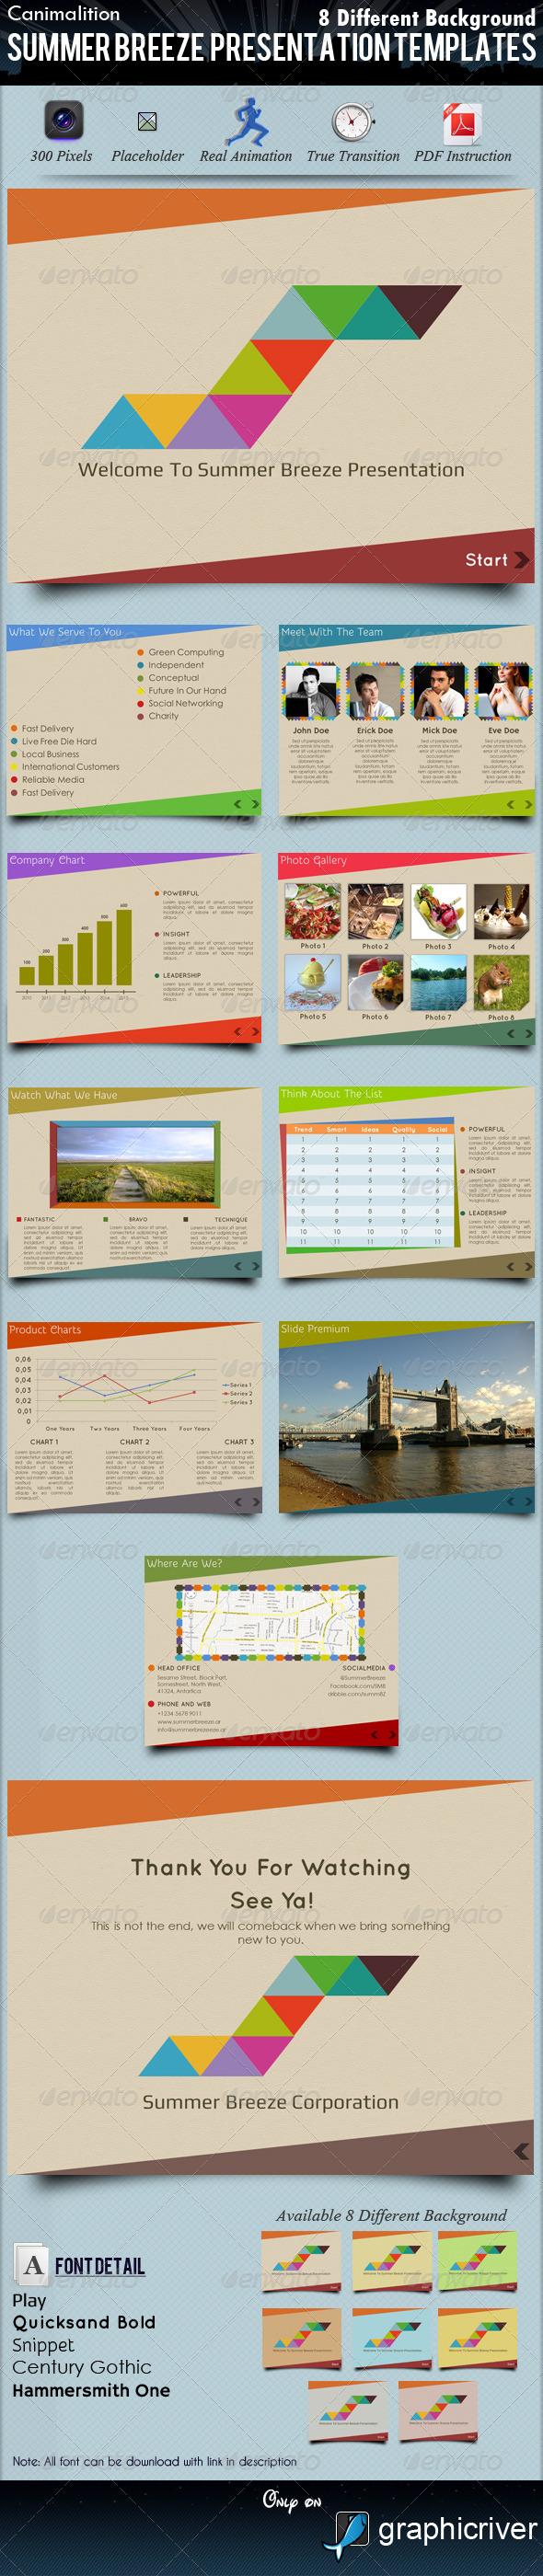 Summer Breeze Presentation Templates - Creative Powerpoint Templates